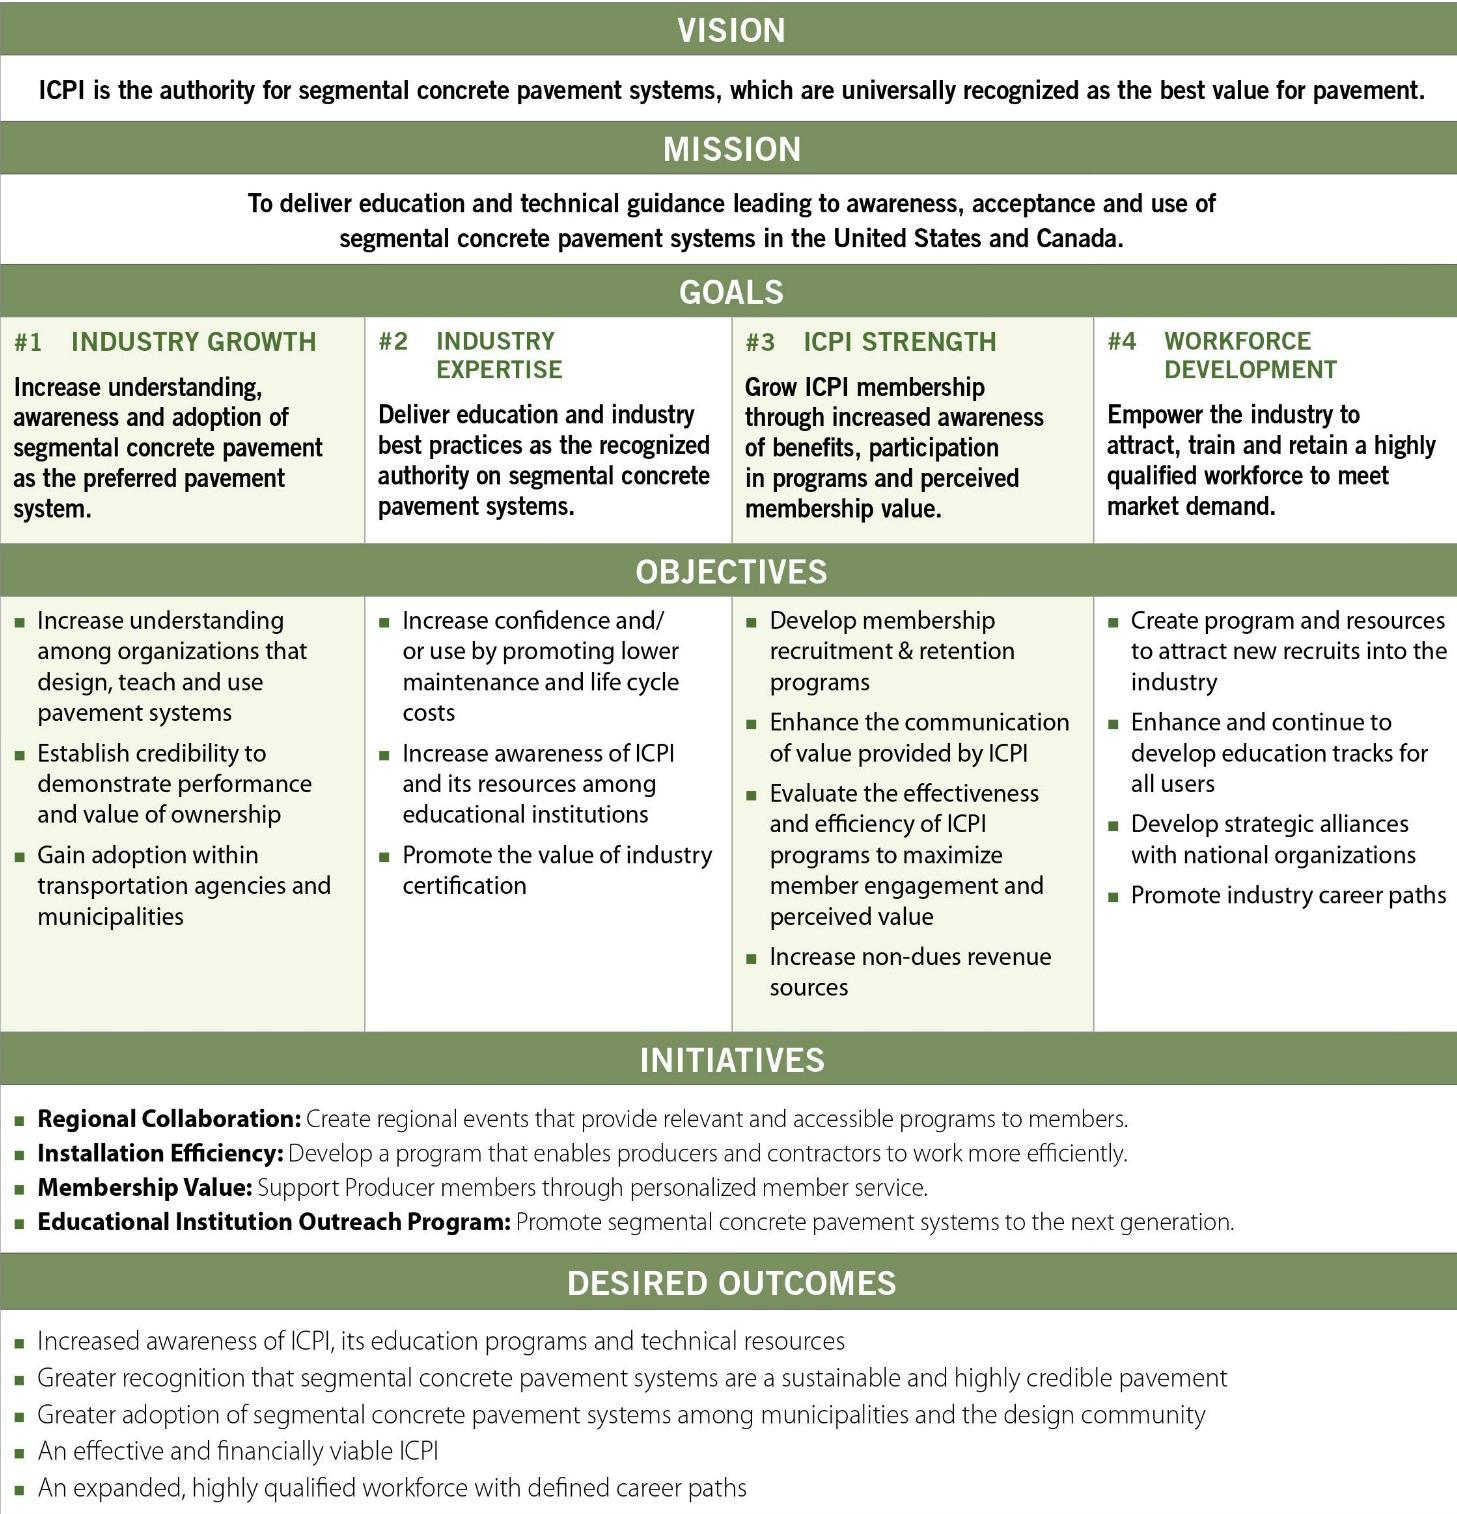 Page 6 of ICPI 2019 22 Strategic Plan